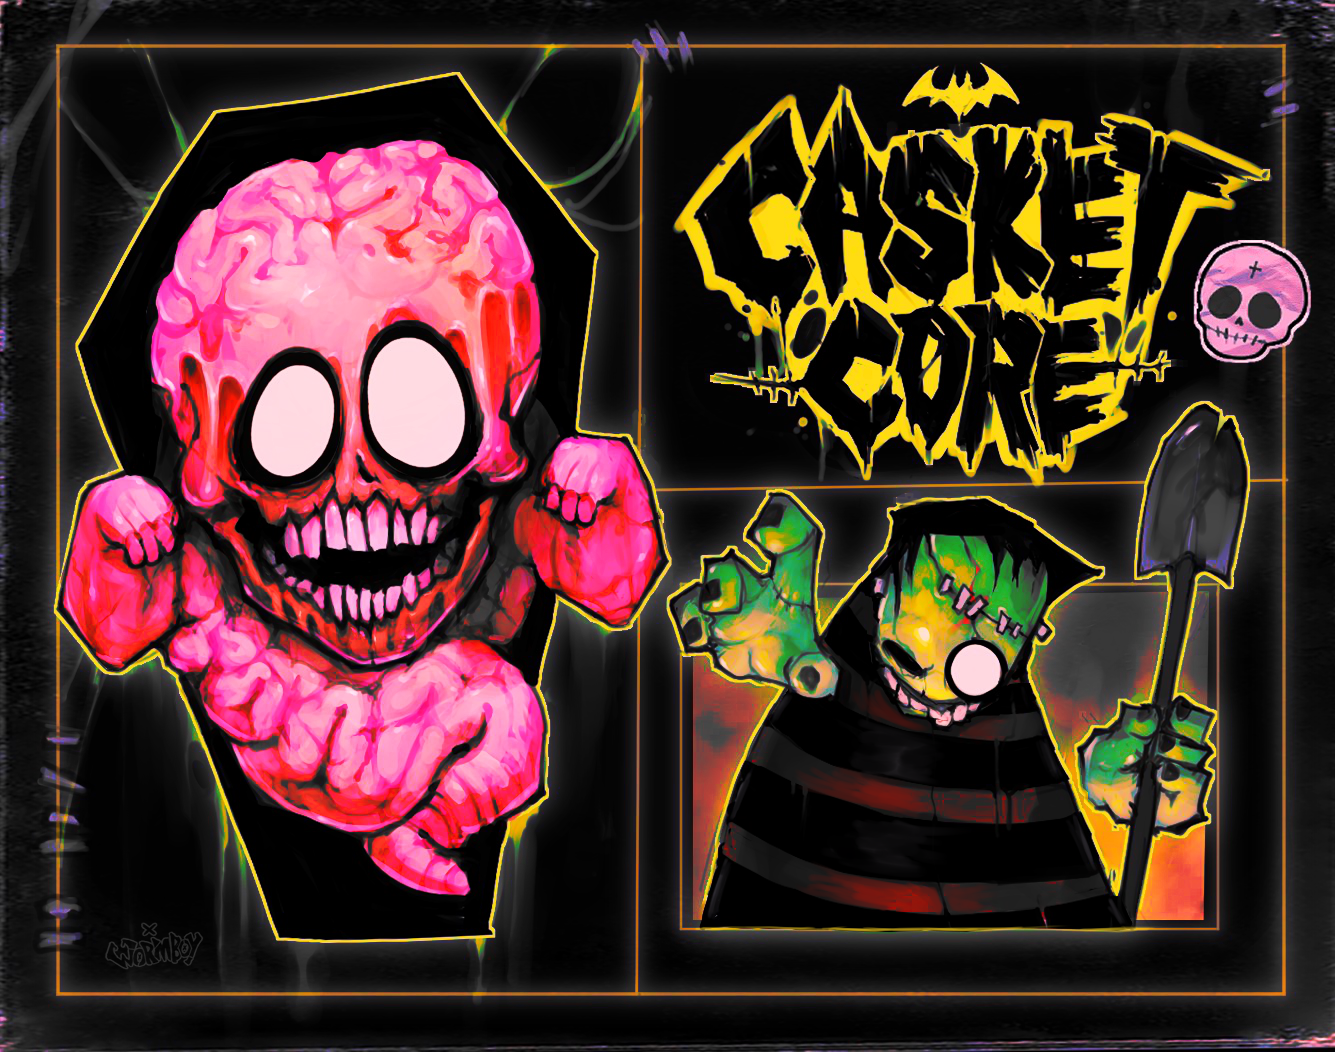 CASKET-CORE